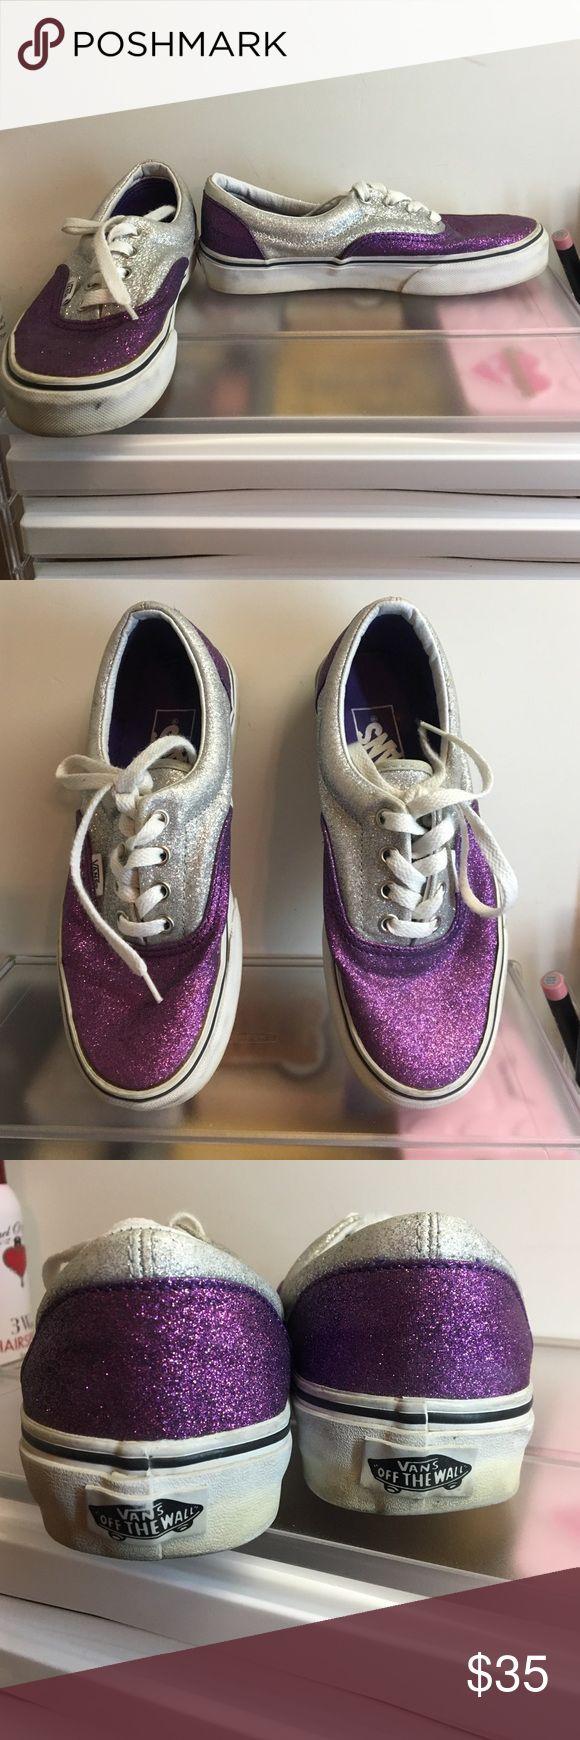 Purple & Silver Glitter Vans Glitter Vans! Lots of wear but still in amazing condition! ❤️20% off all bundles❤️ Vans Shoes Sneakers